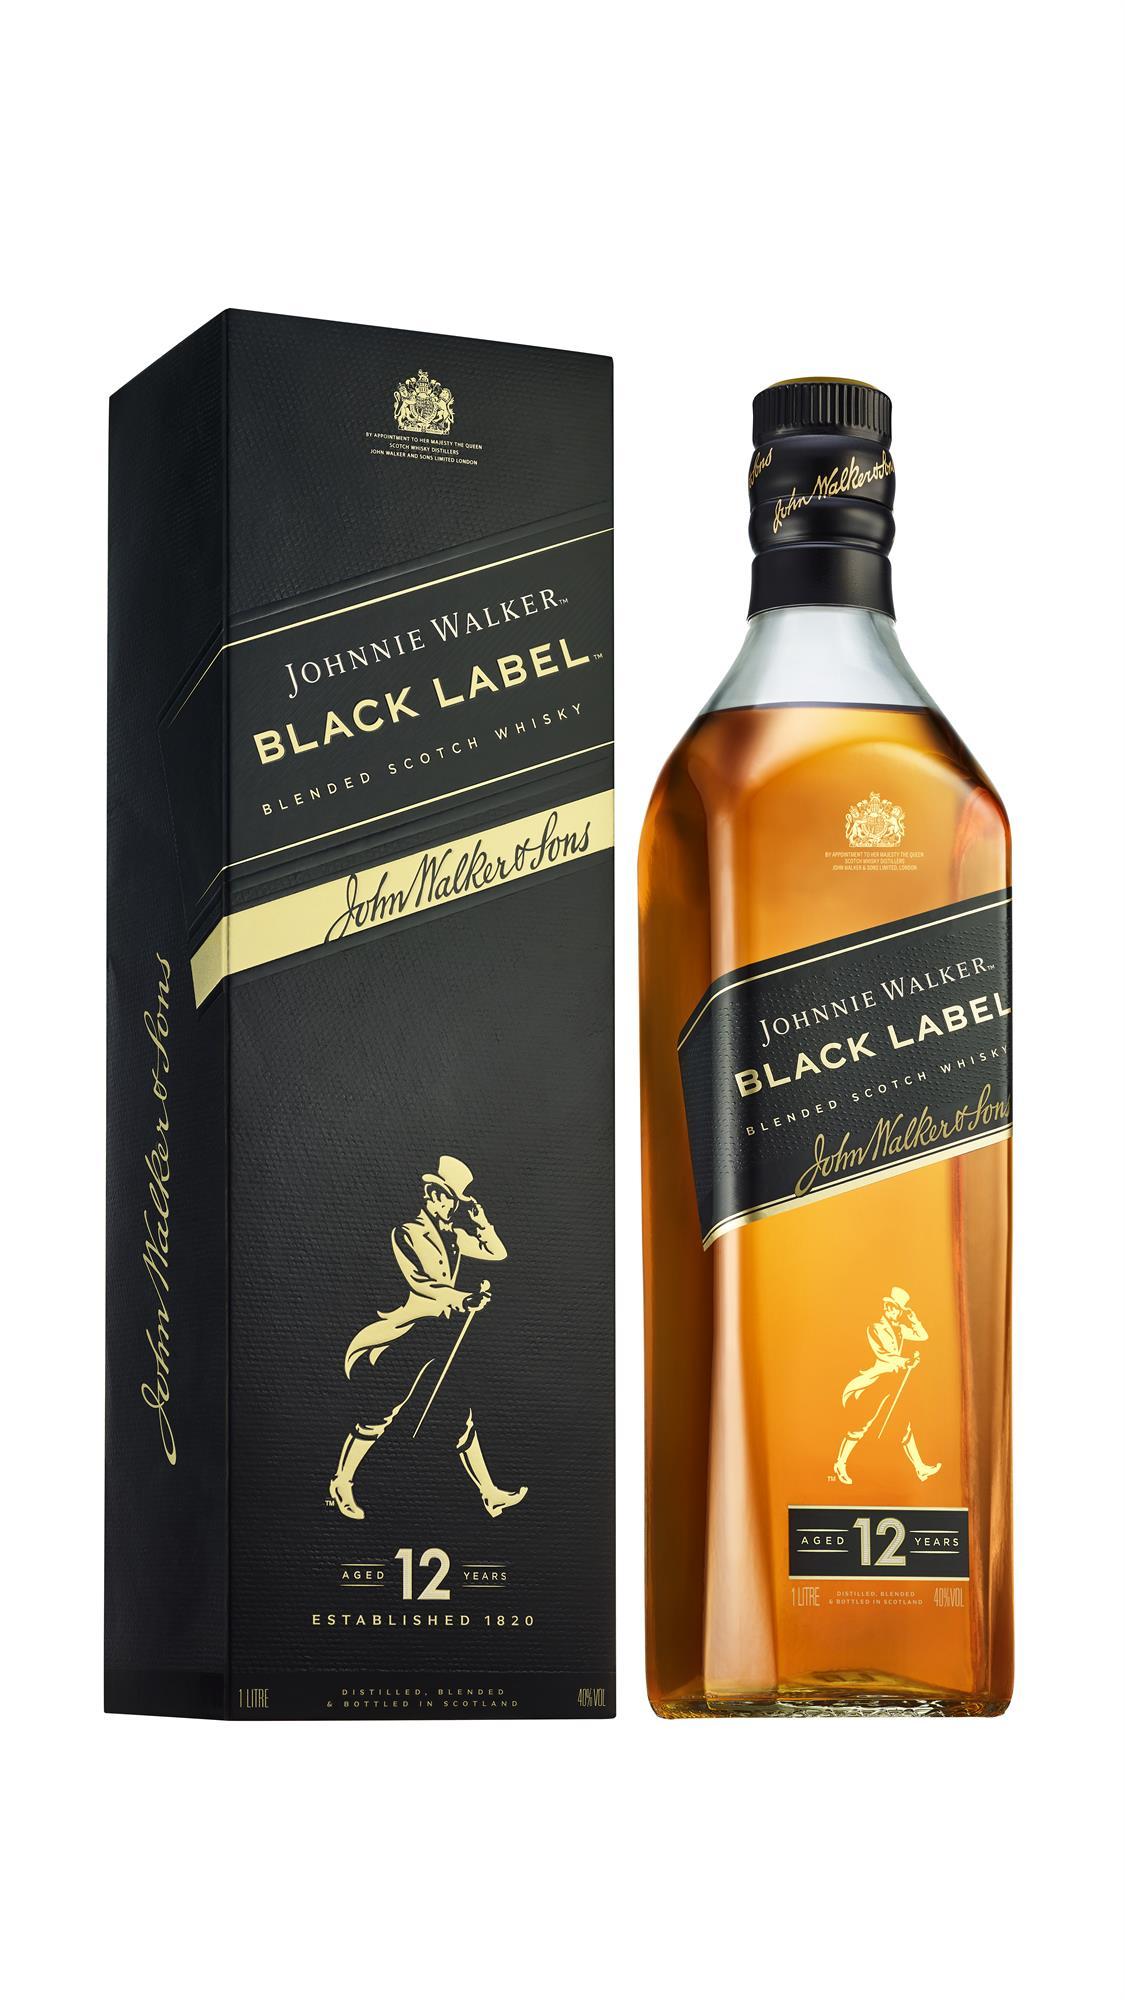 WHISKY JOHNNIE WALKER BLACK LABEL BOTELLA 1 LITRO